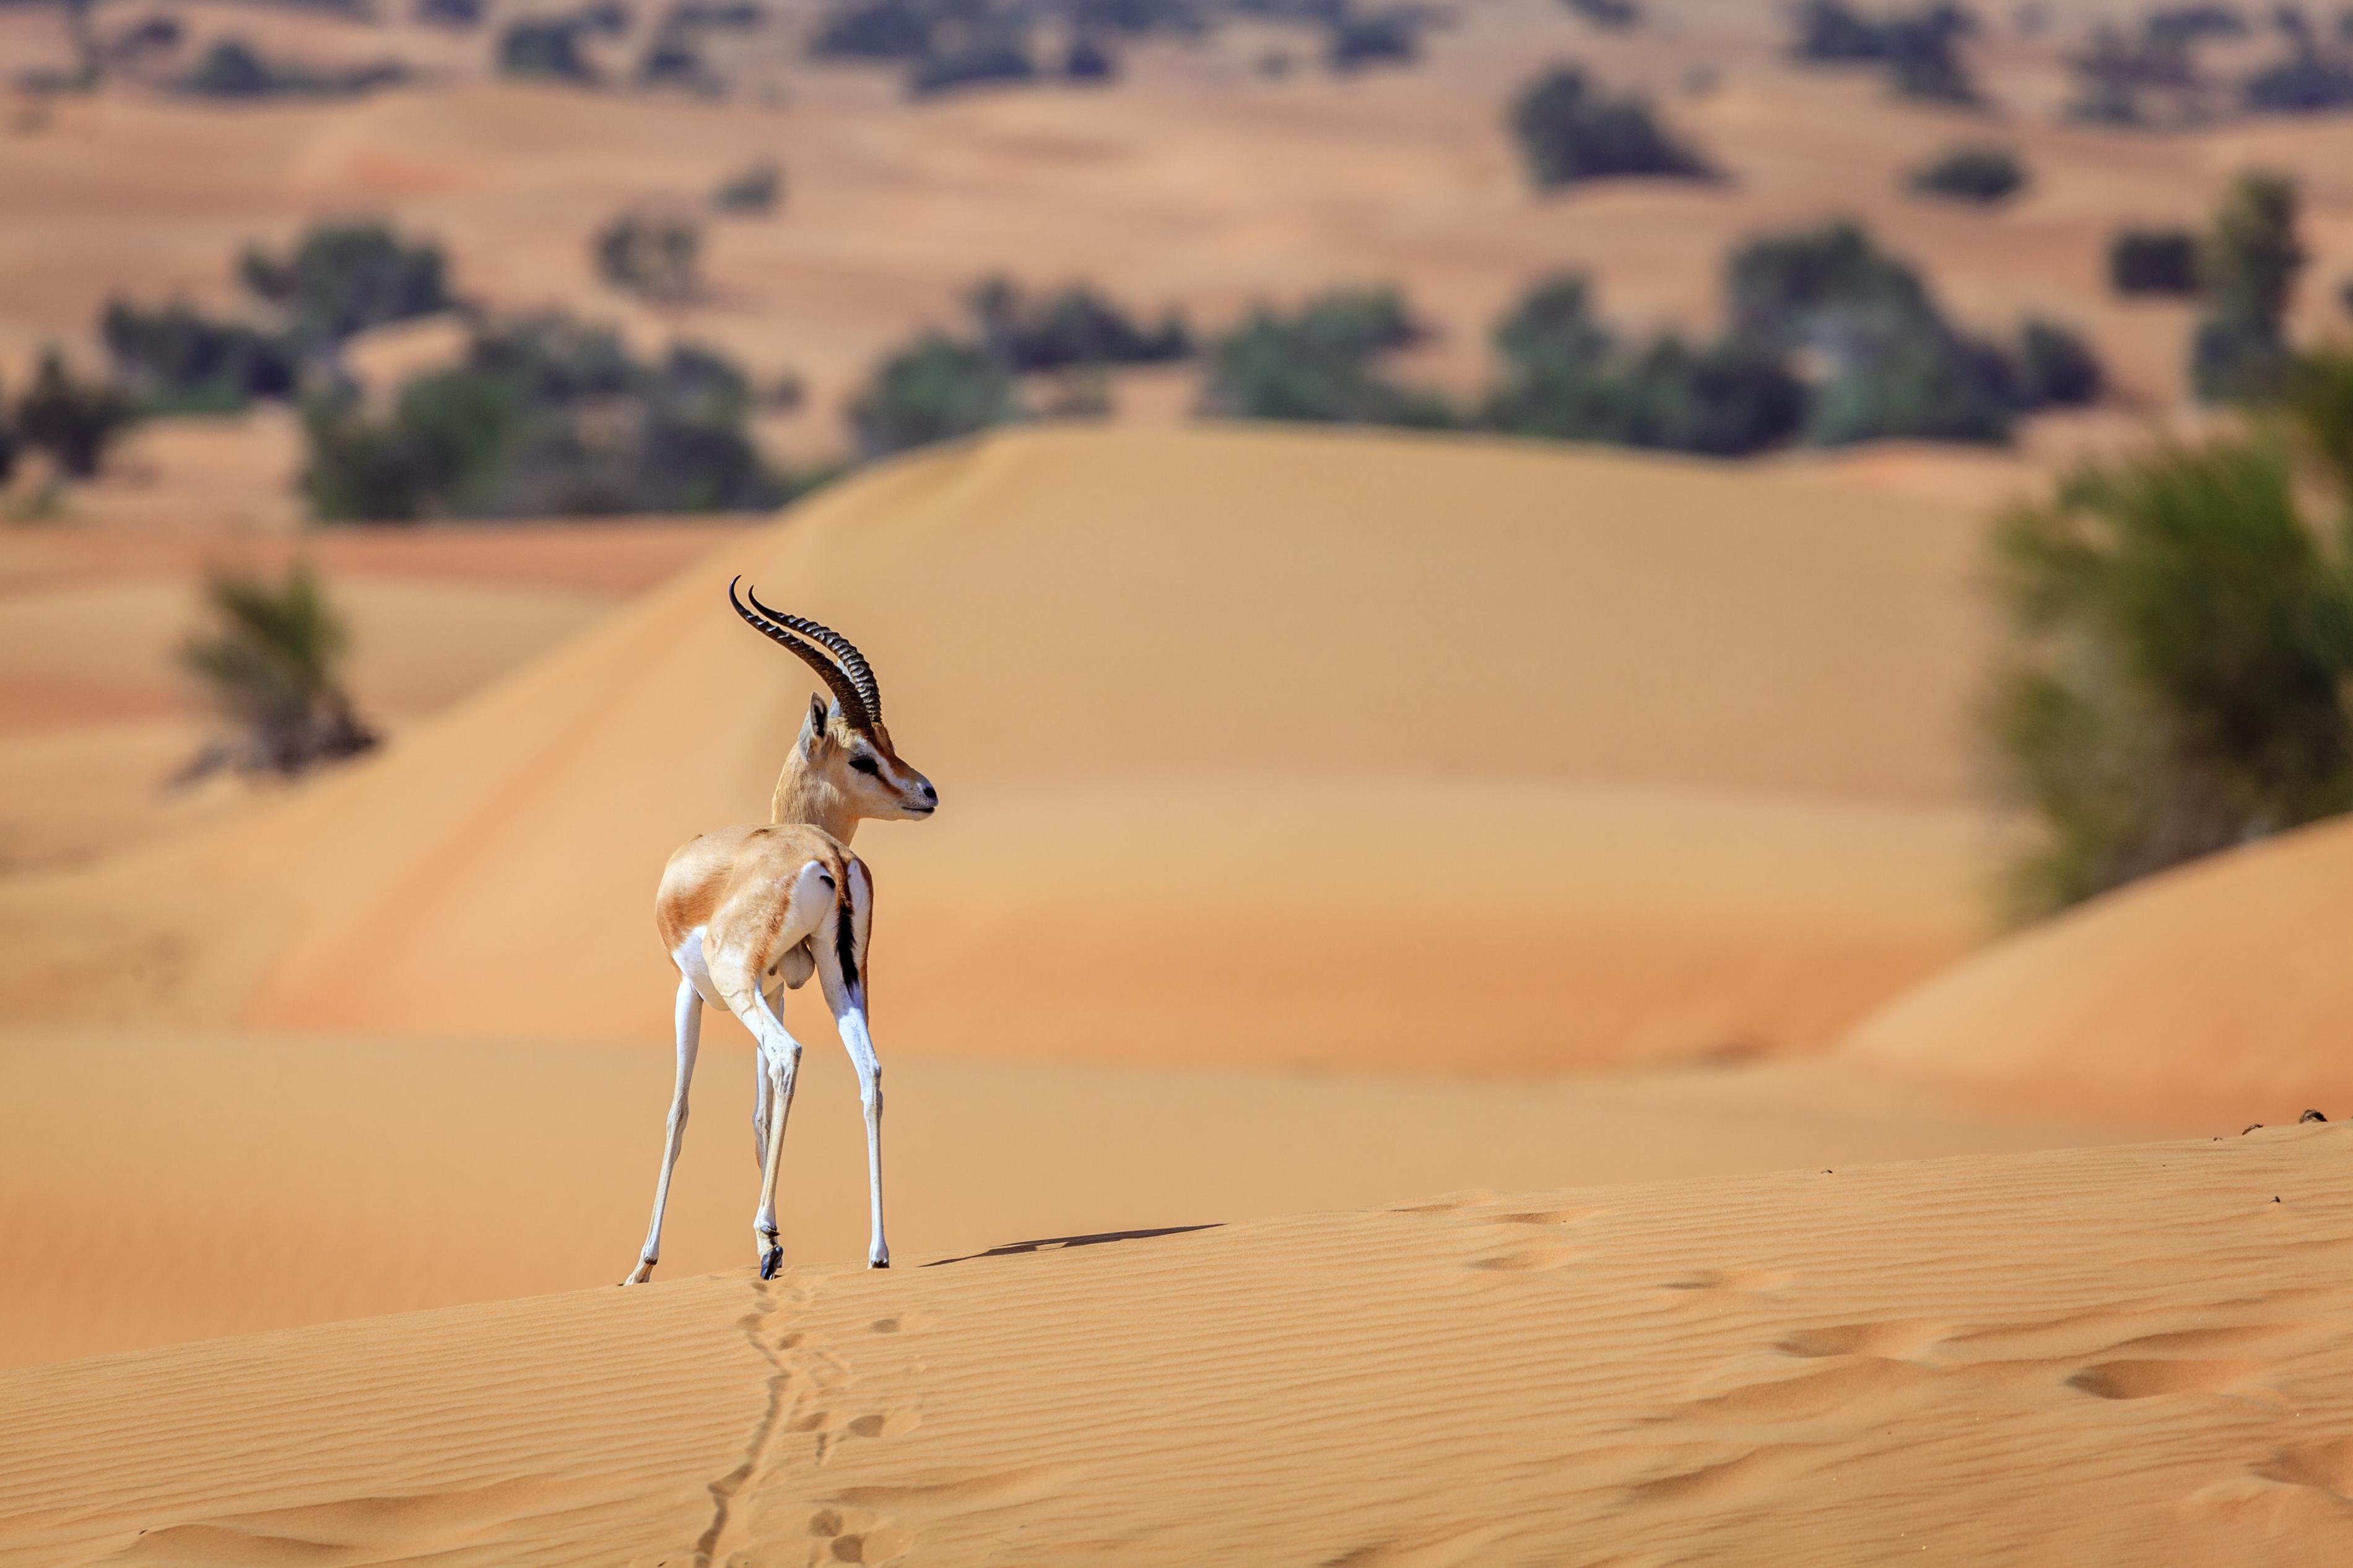 Desert Falcon UAE Dhabi